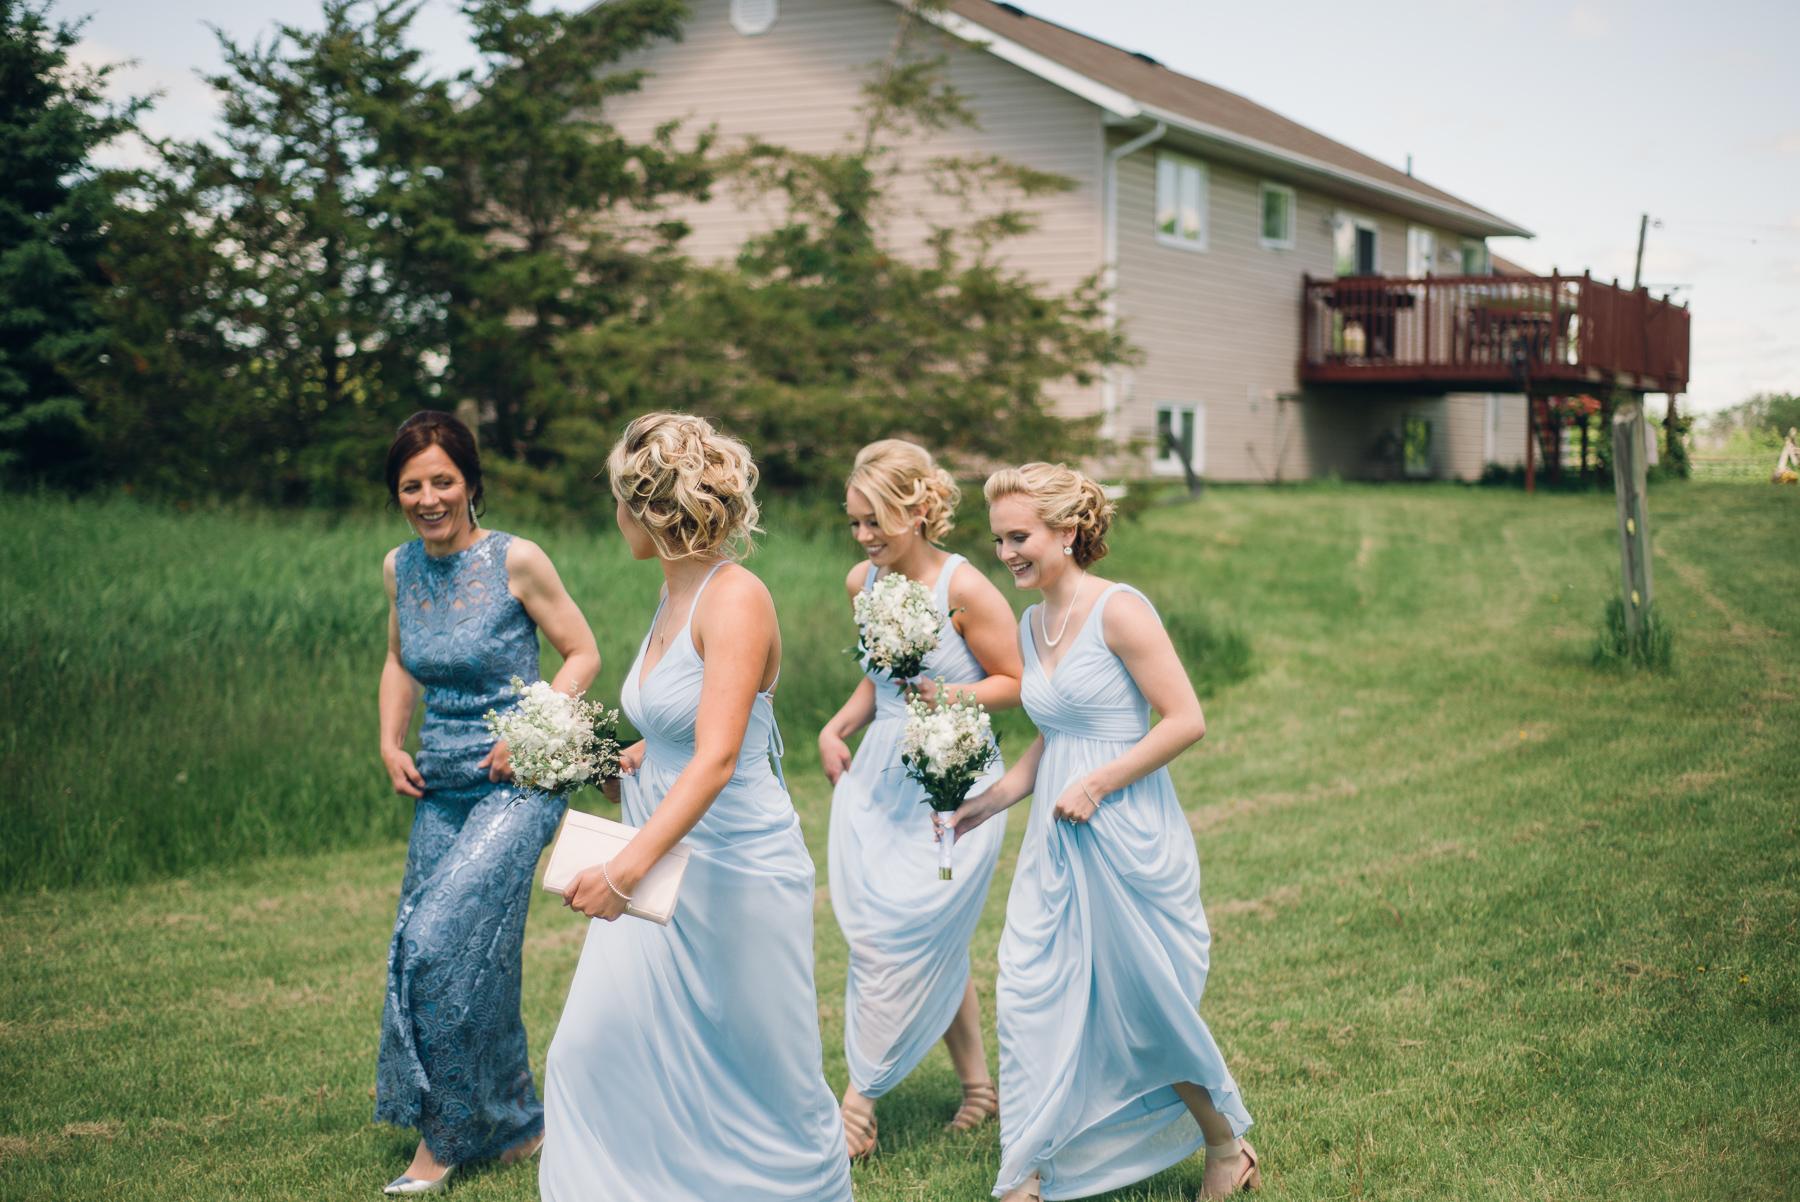 Kingston Wedding_Alabaster Jar Photography (7 of 42).jpg